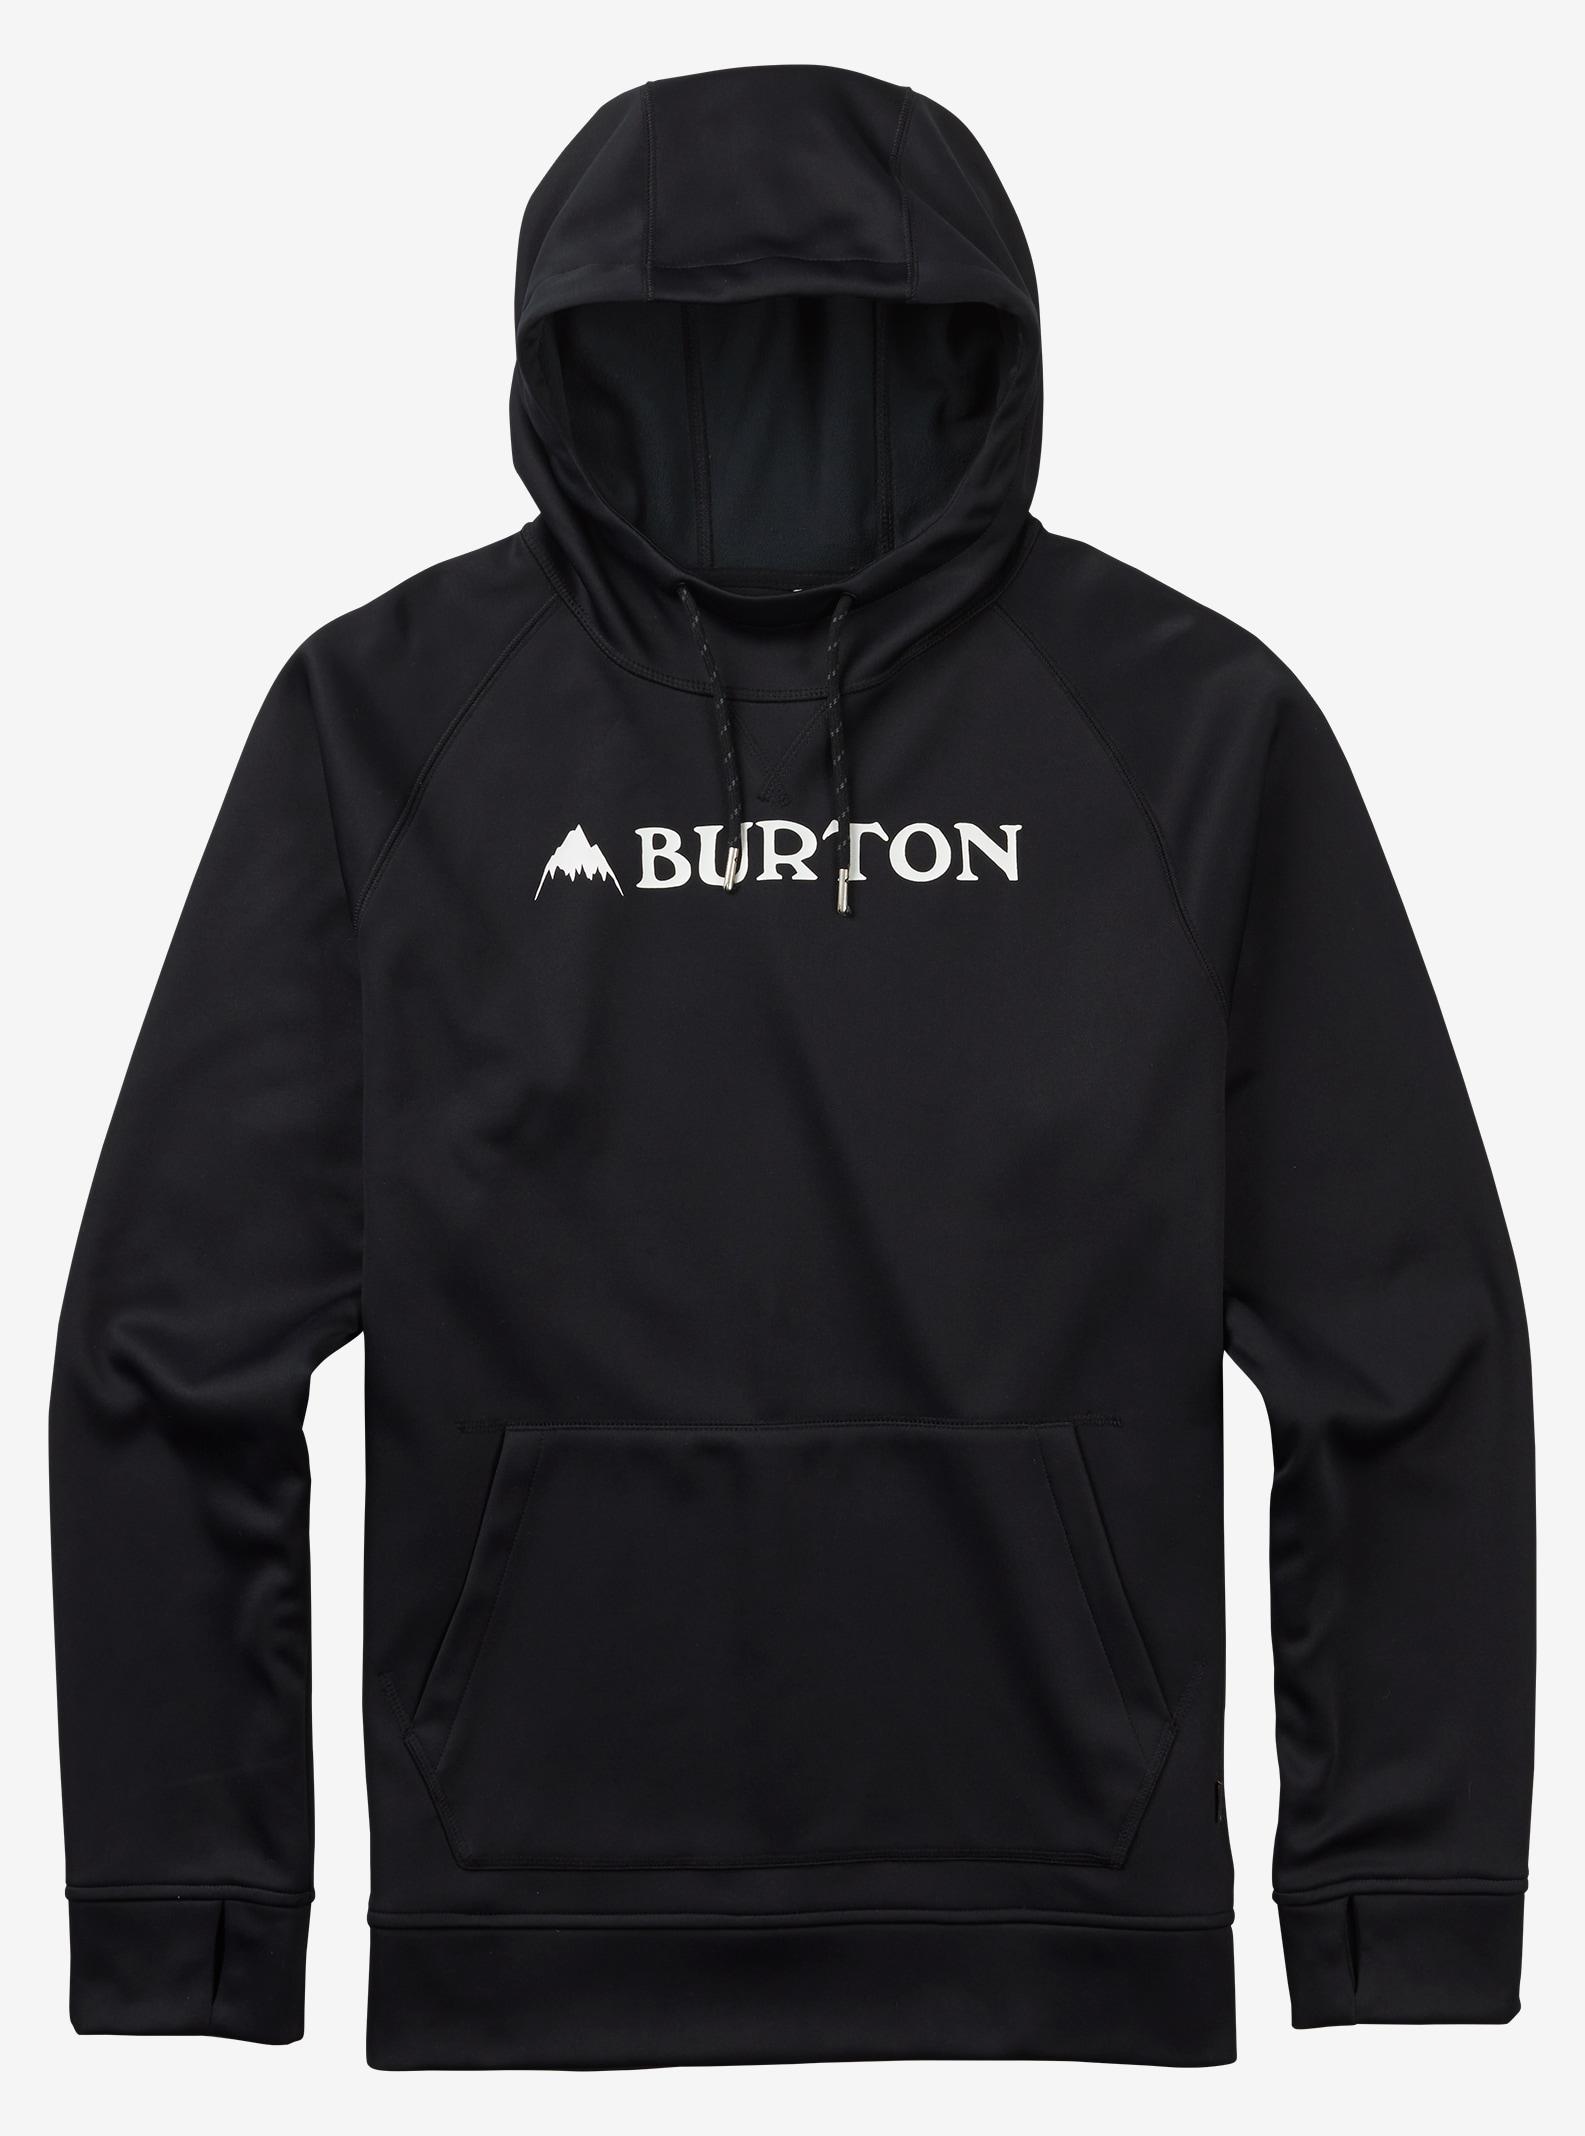 Burton Crown Bonded Hoodie angezeigt in True Black